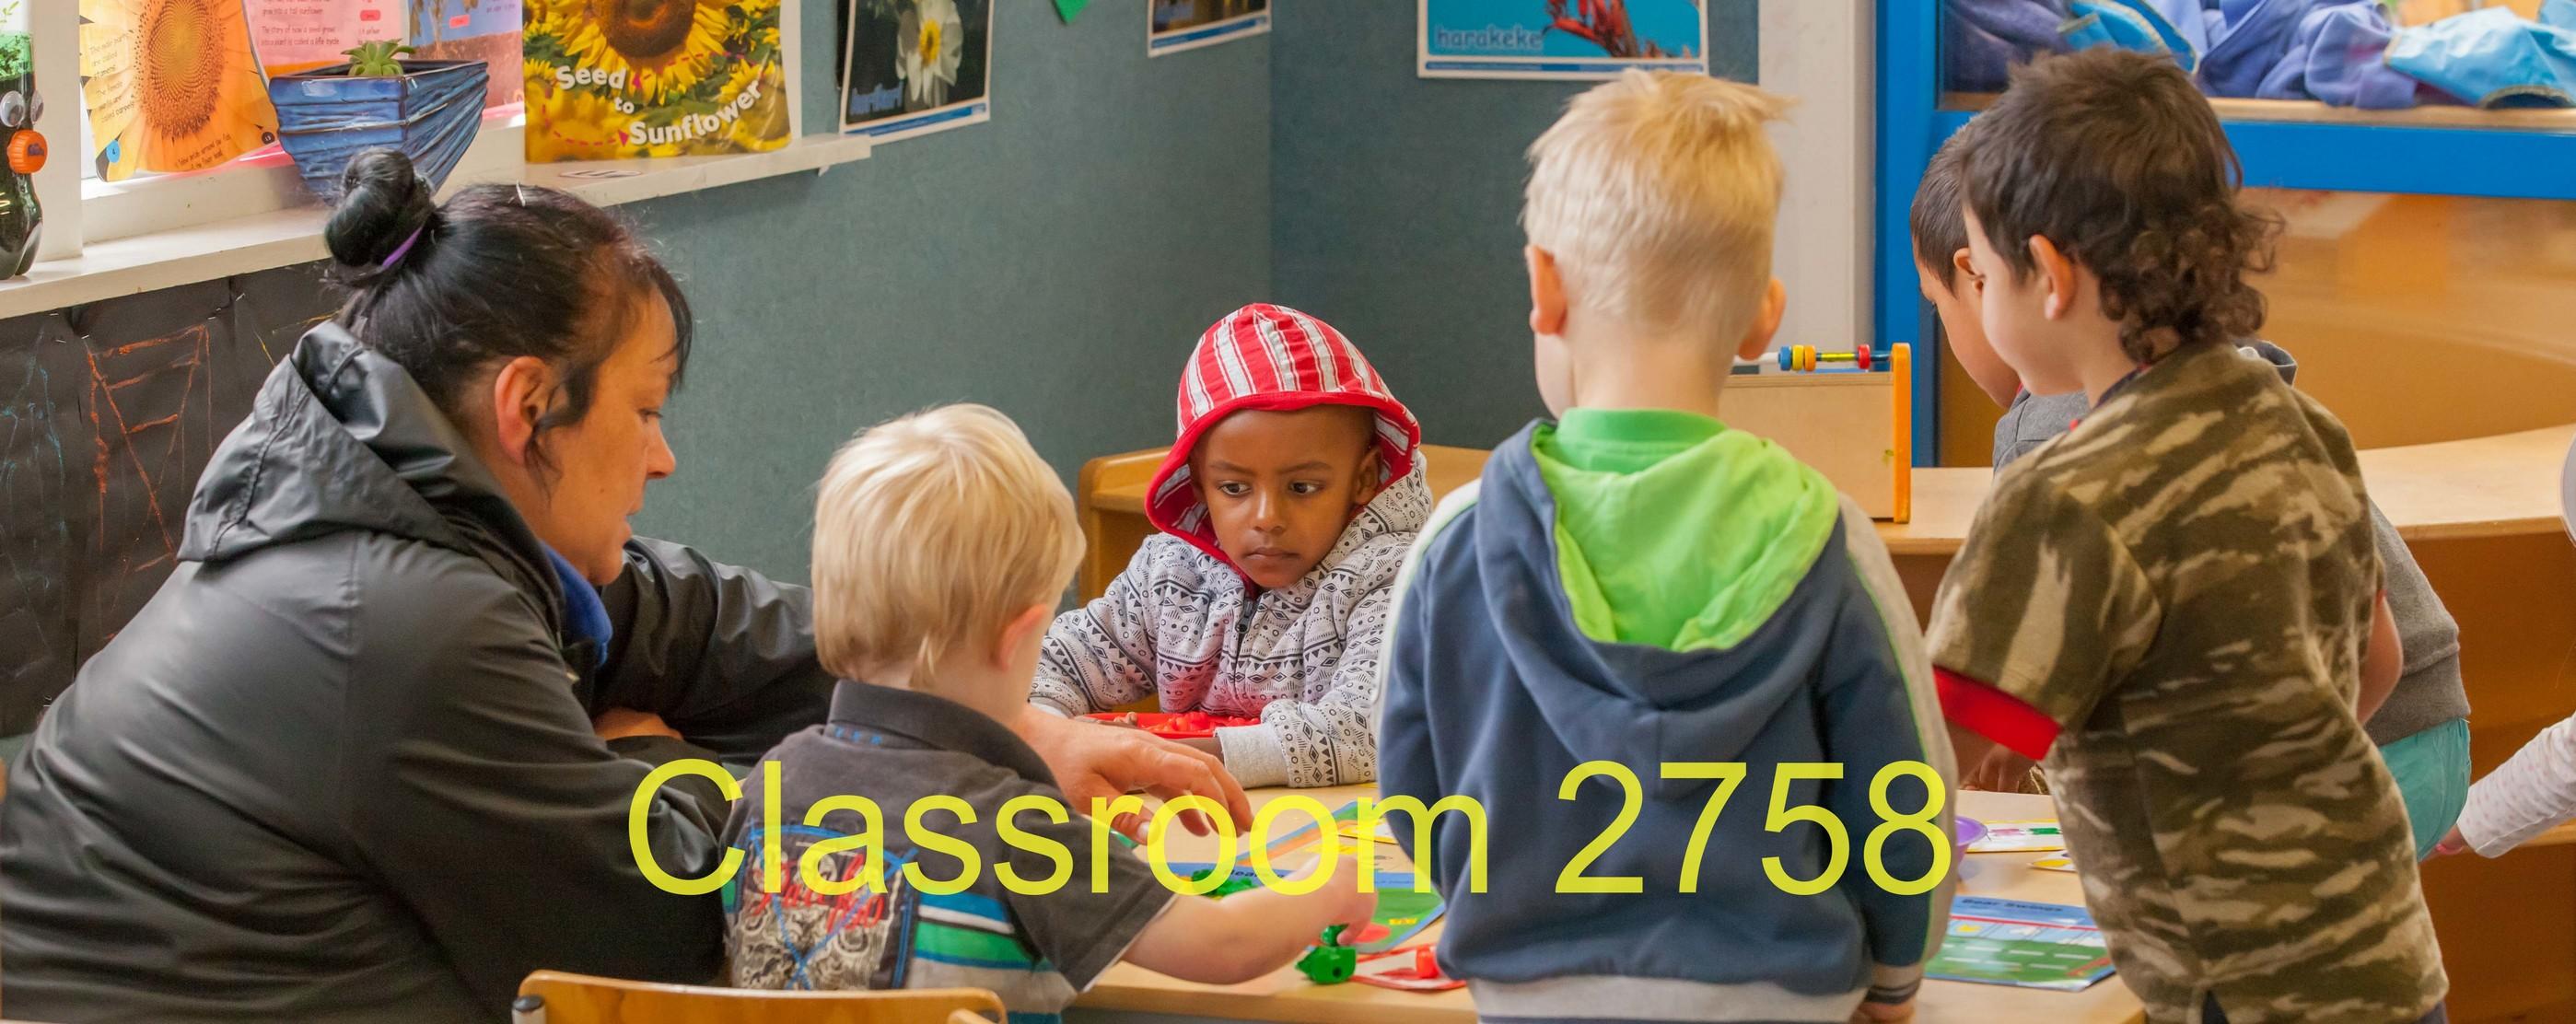 Classroom 2758